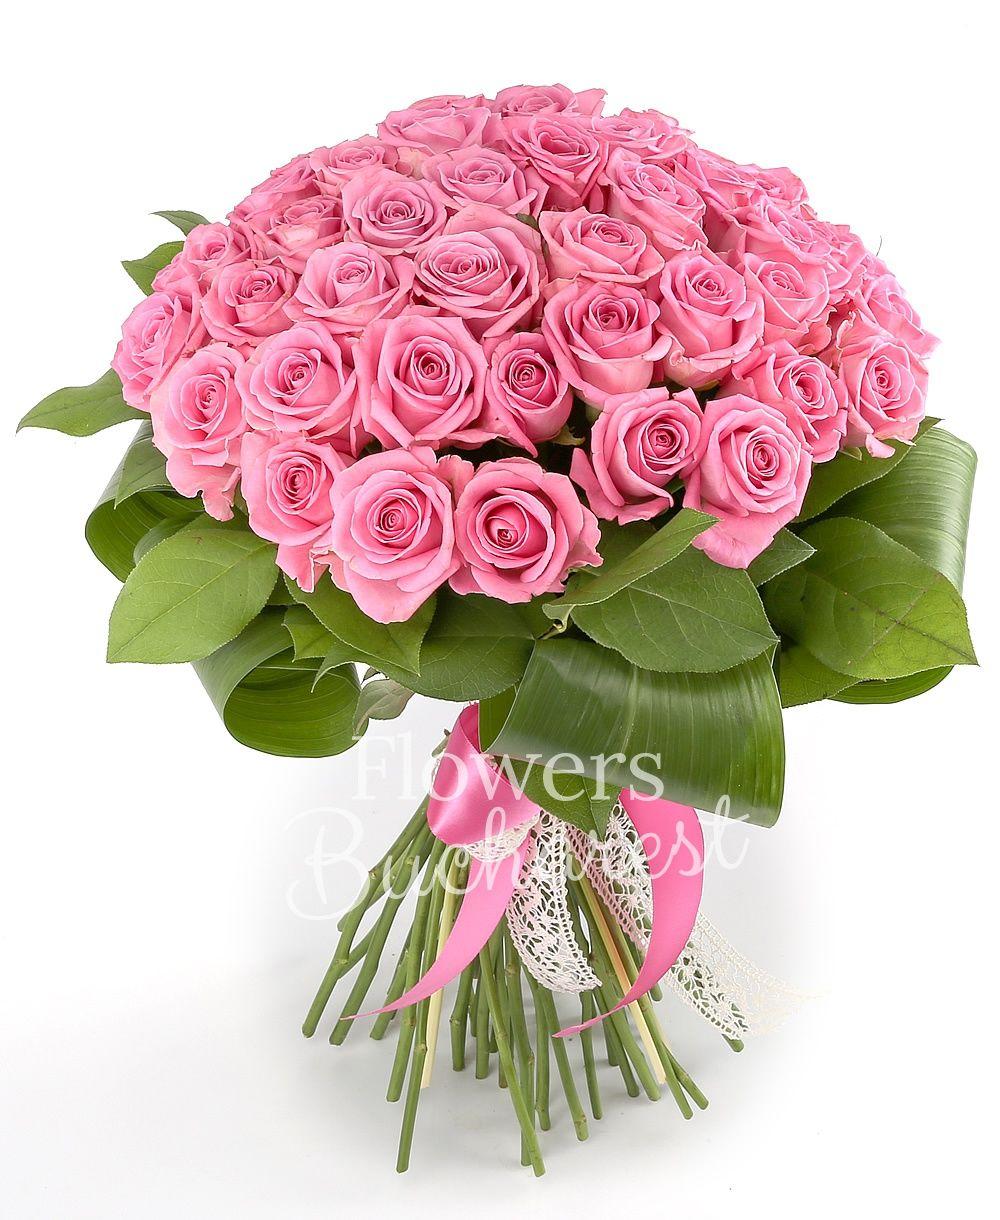 41 pink roses, greenery